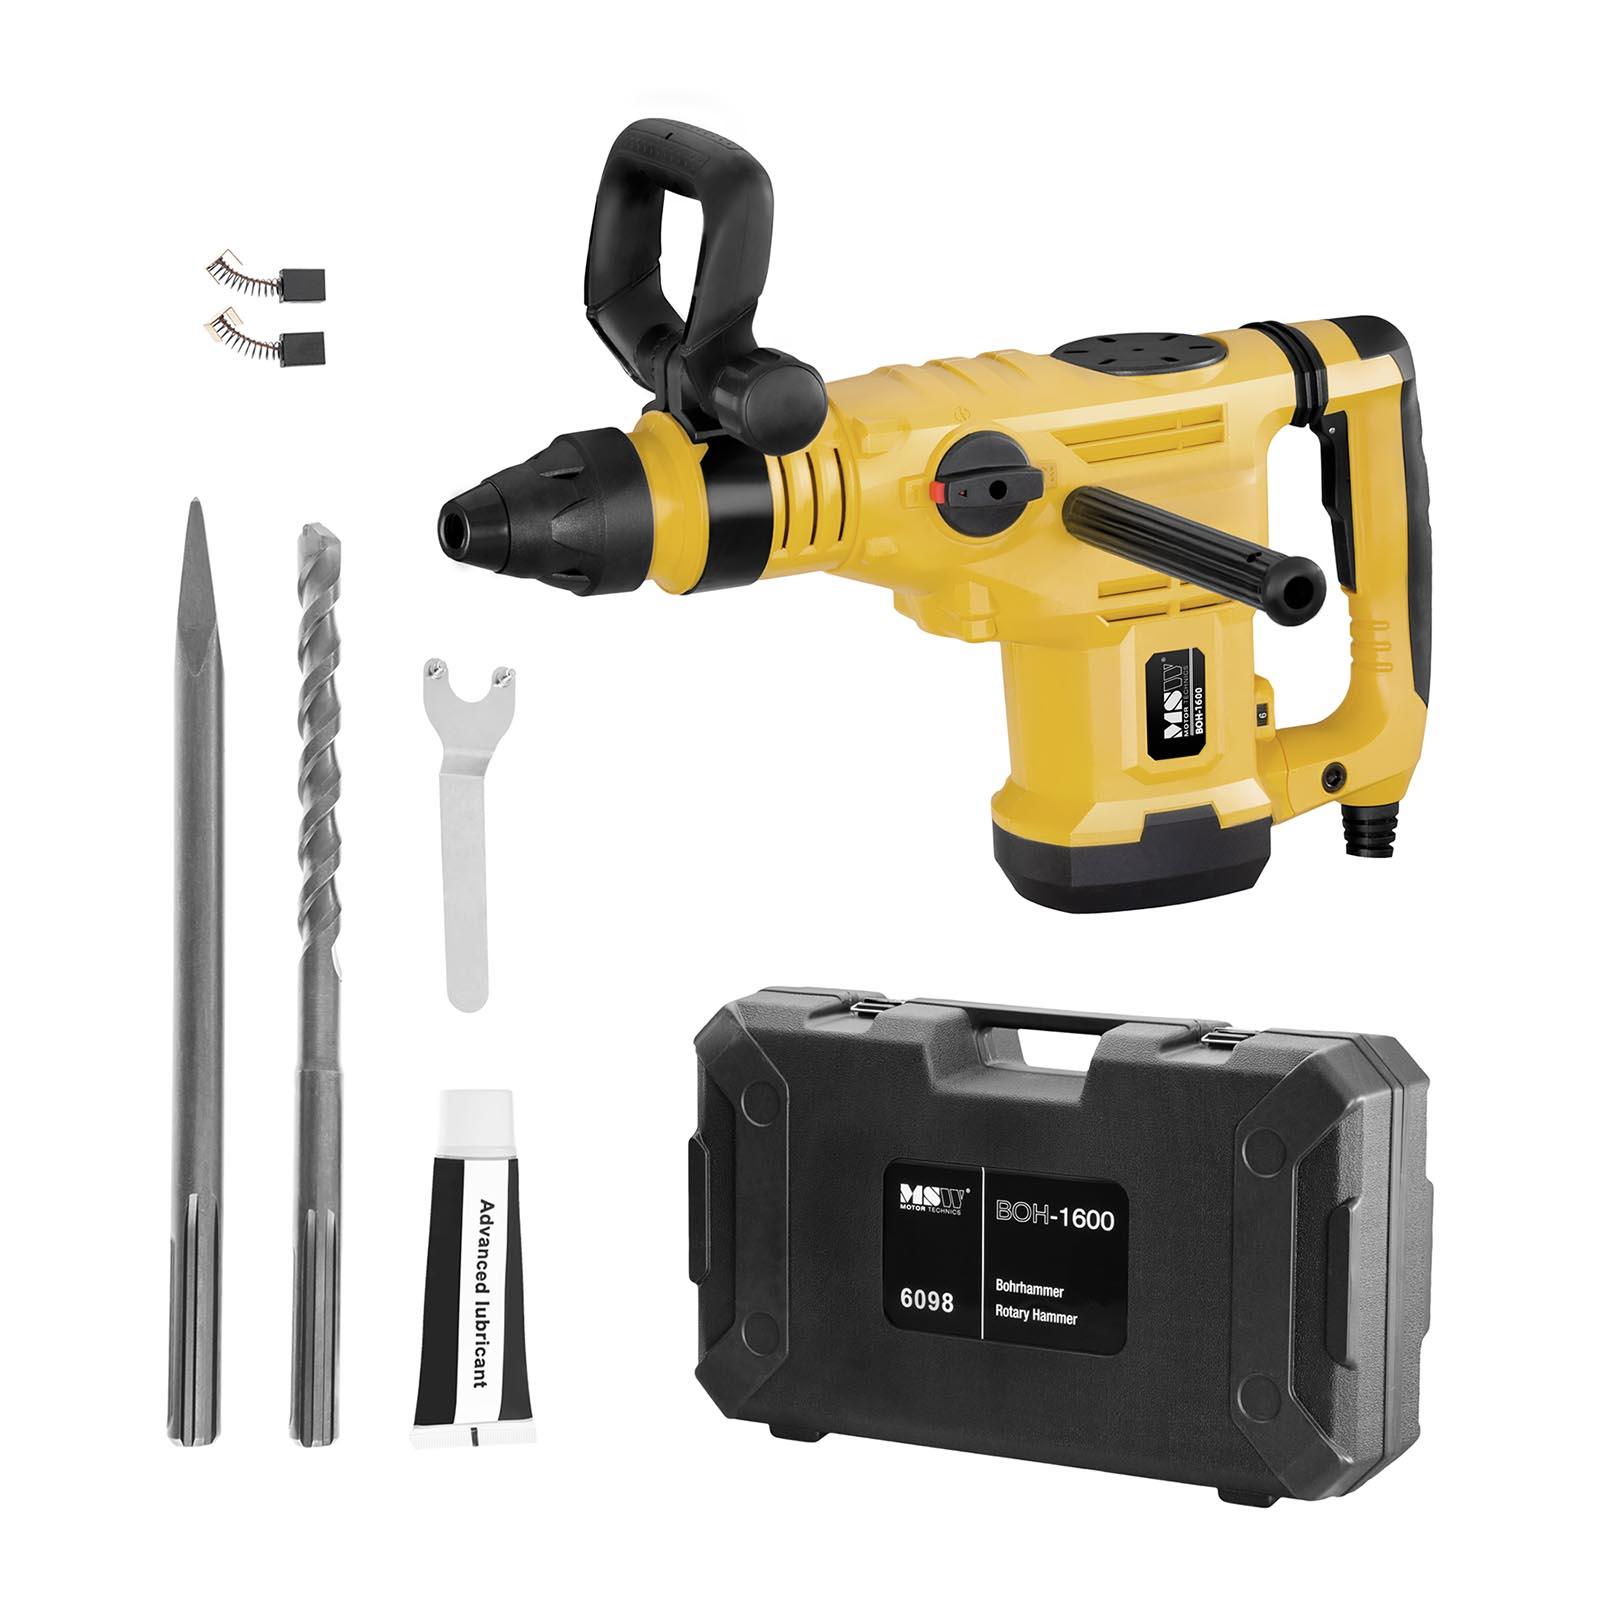 MSW Bohrhammer - 1600 W - 330 U/min 10060098